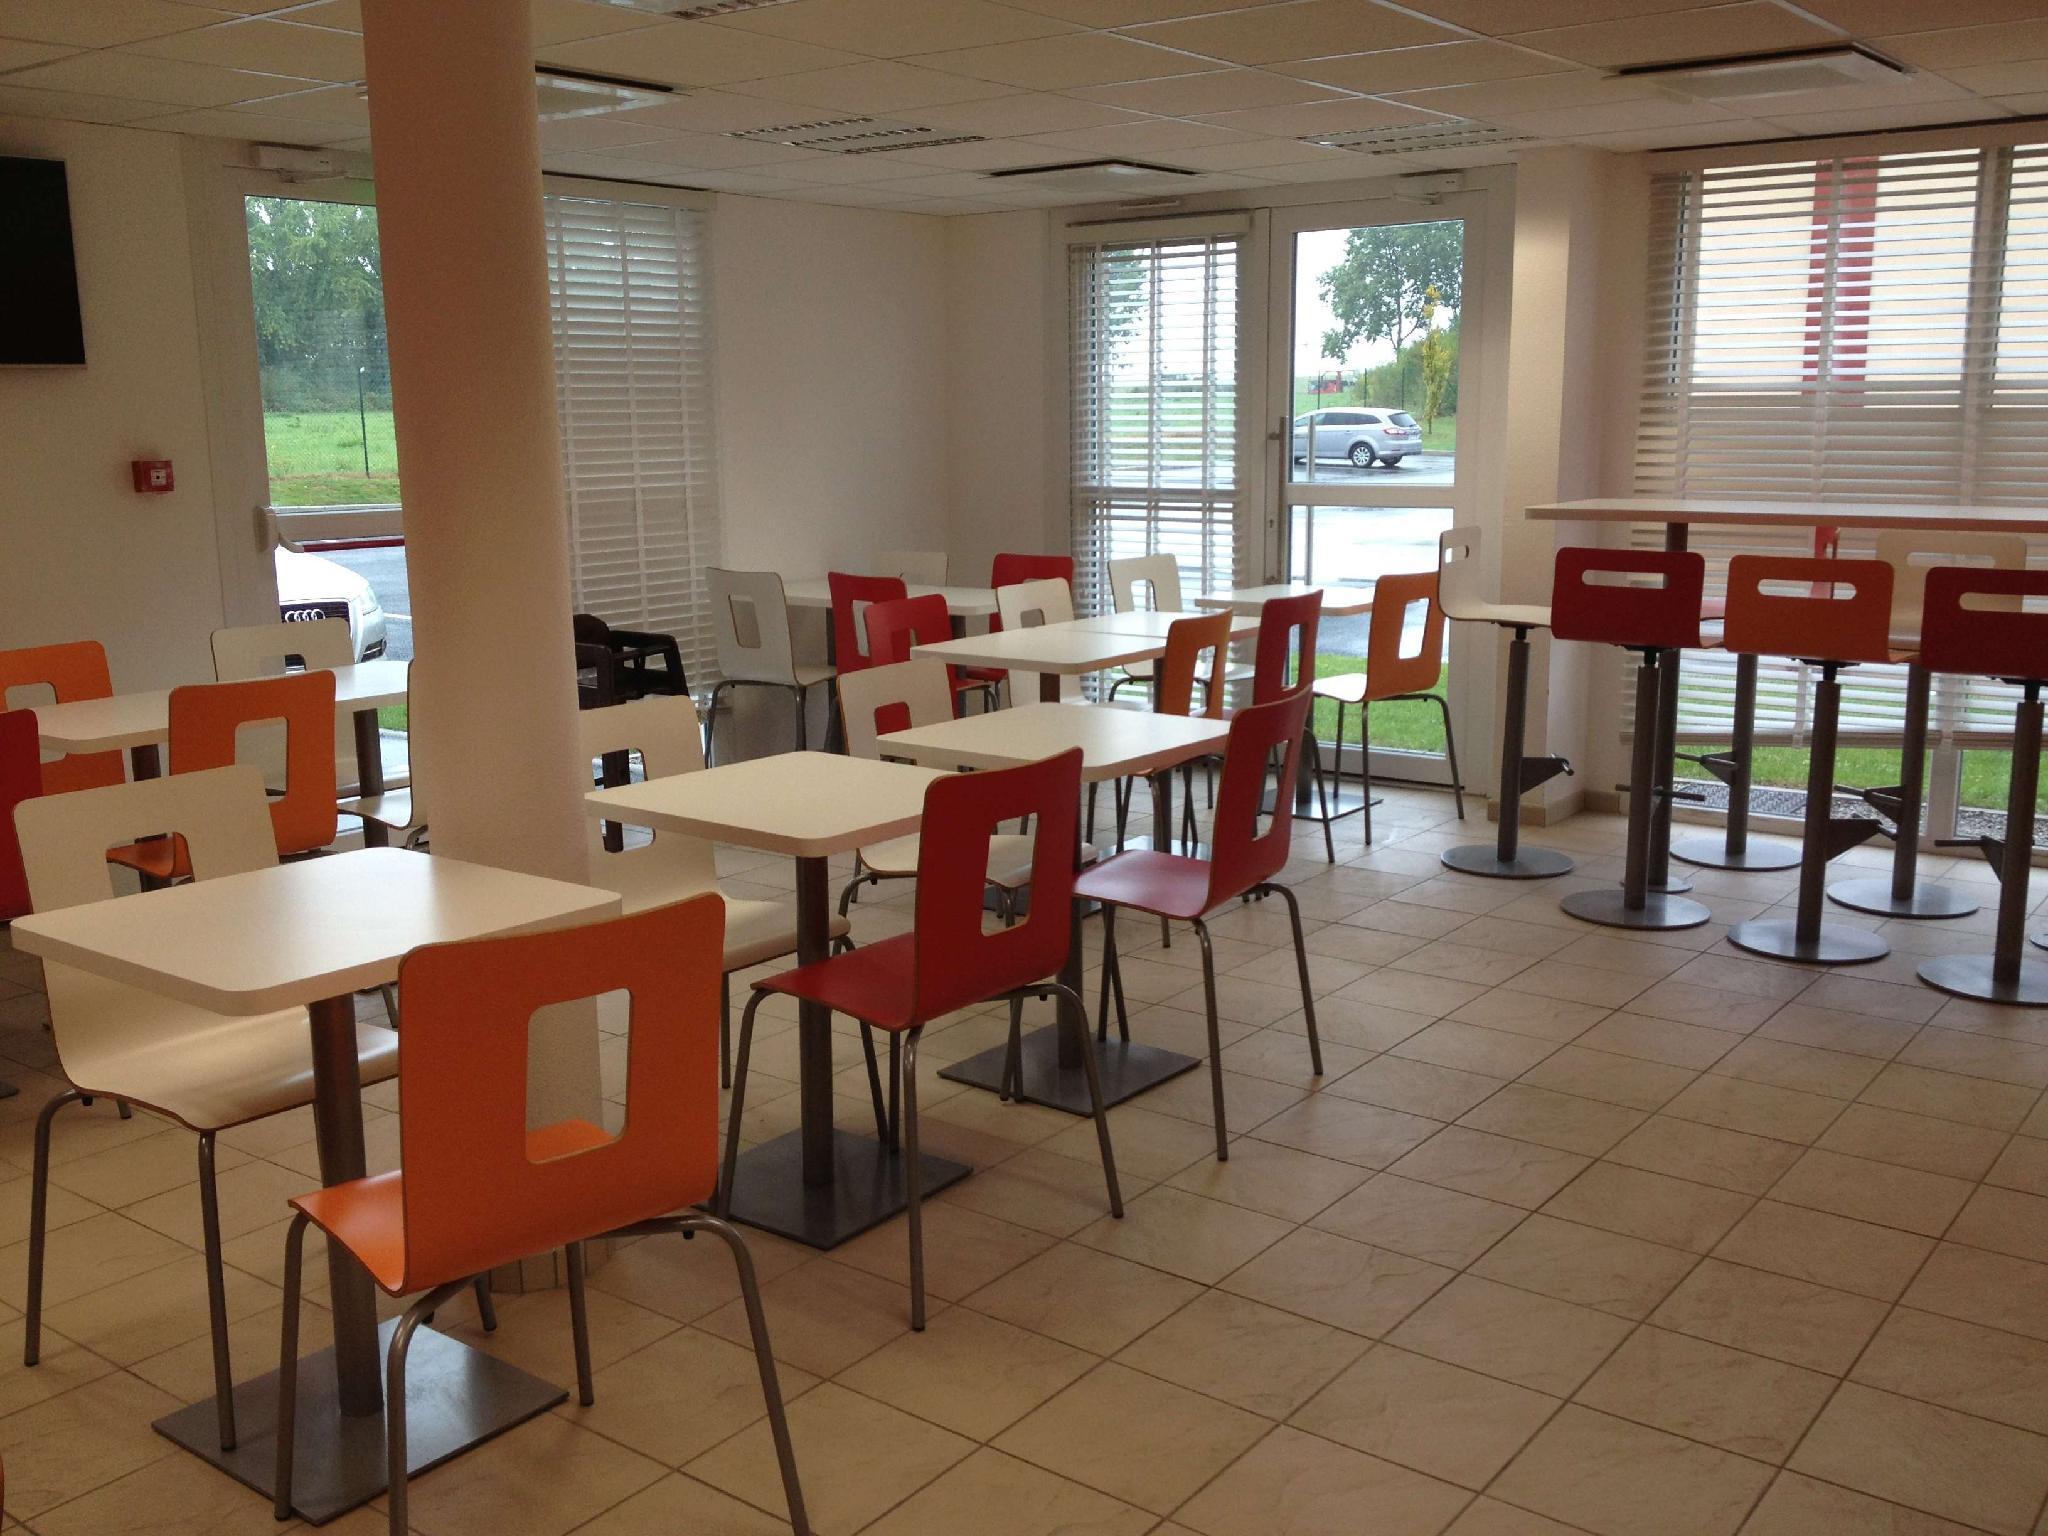 Premiere Classe Hotel Roissy - Aeroport CDG - Le Mesnil-Amelot, Seine-et-Marne